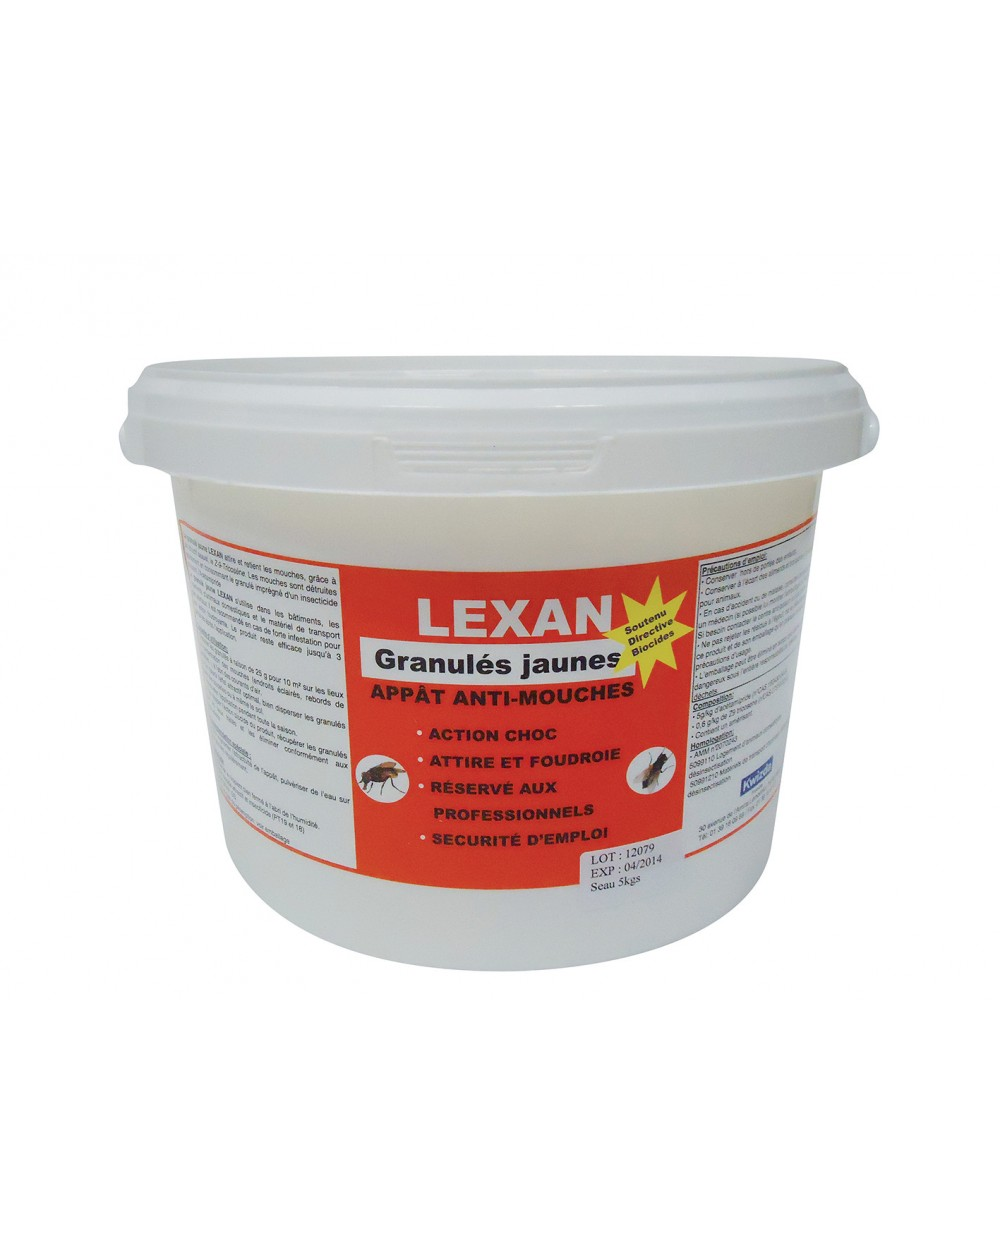 LEXAN GRANULES JAUNES en 5kg